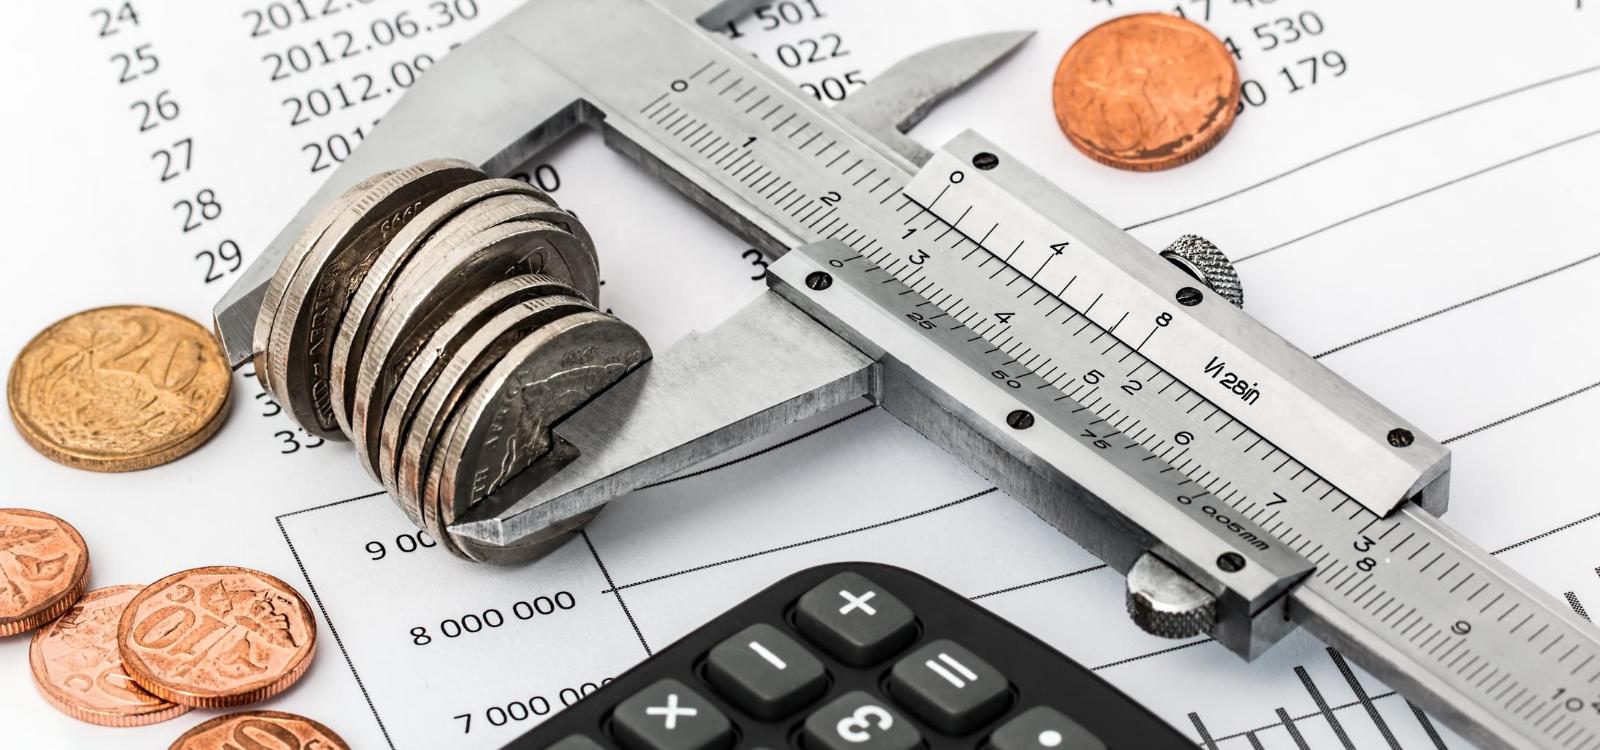 Warren Averett purchase accounting image